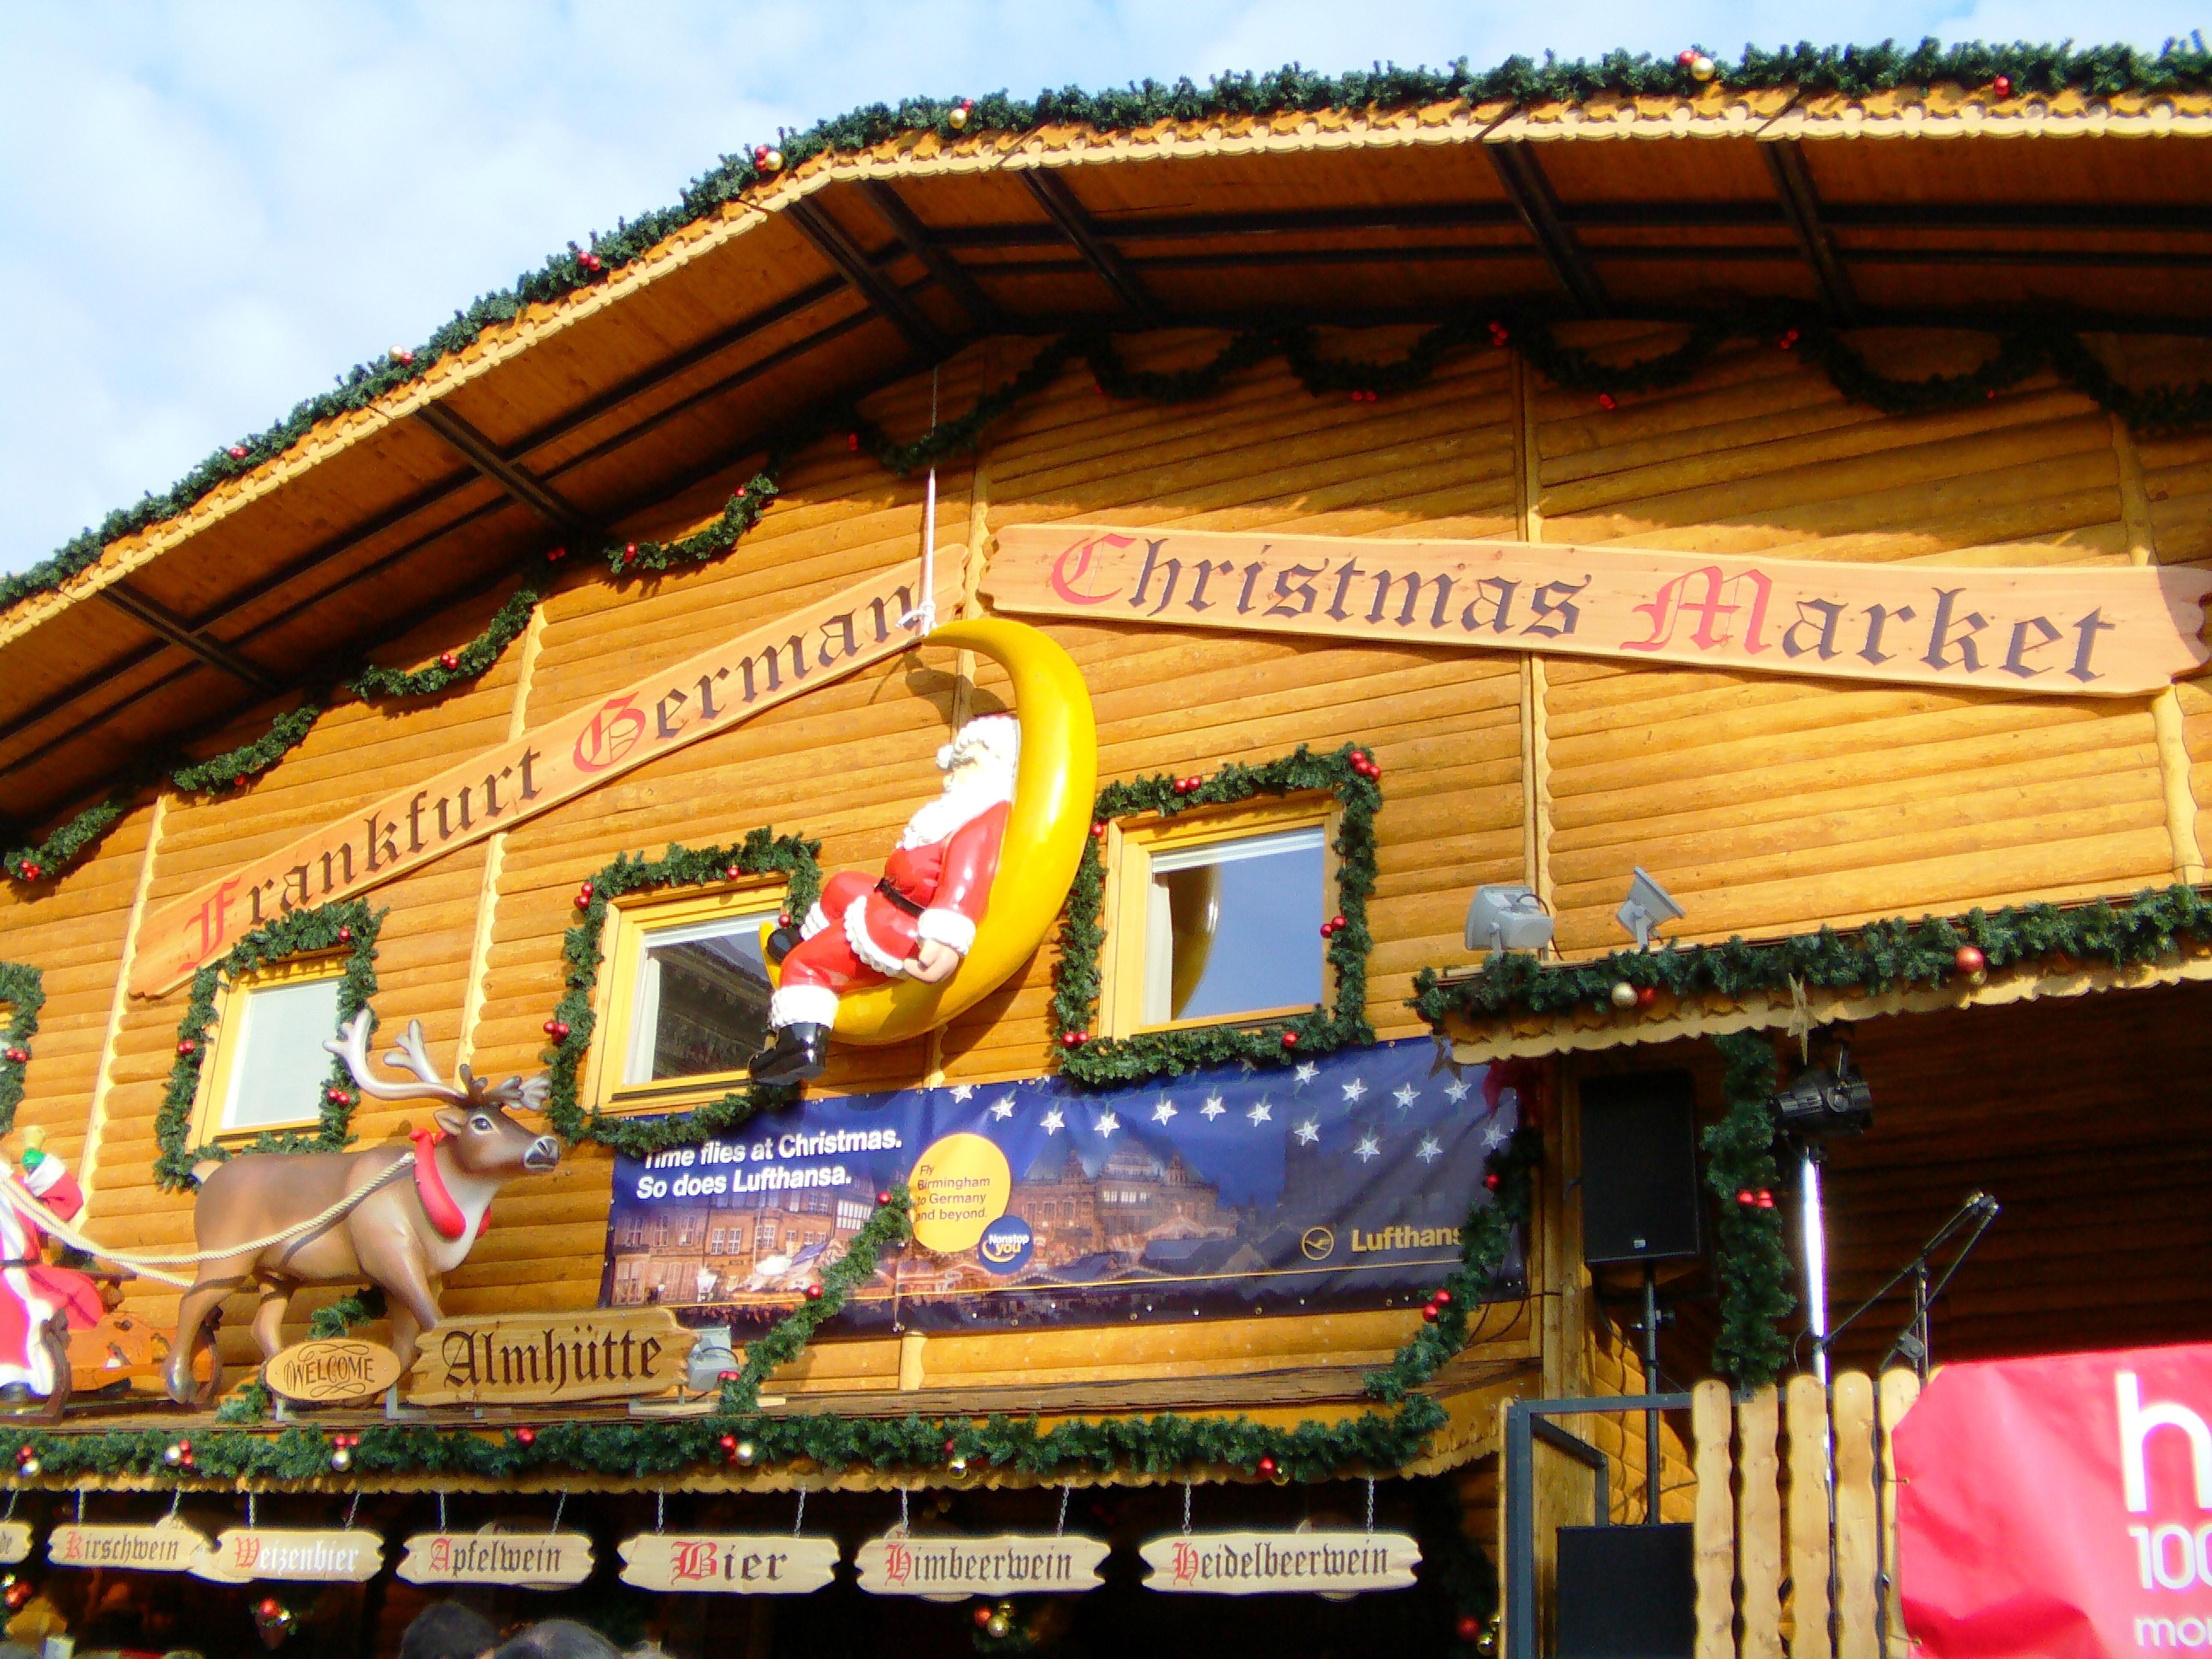 birmingham christmas market sunday